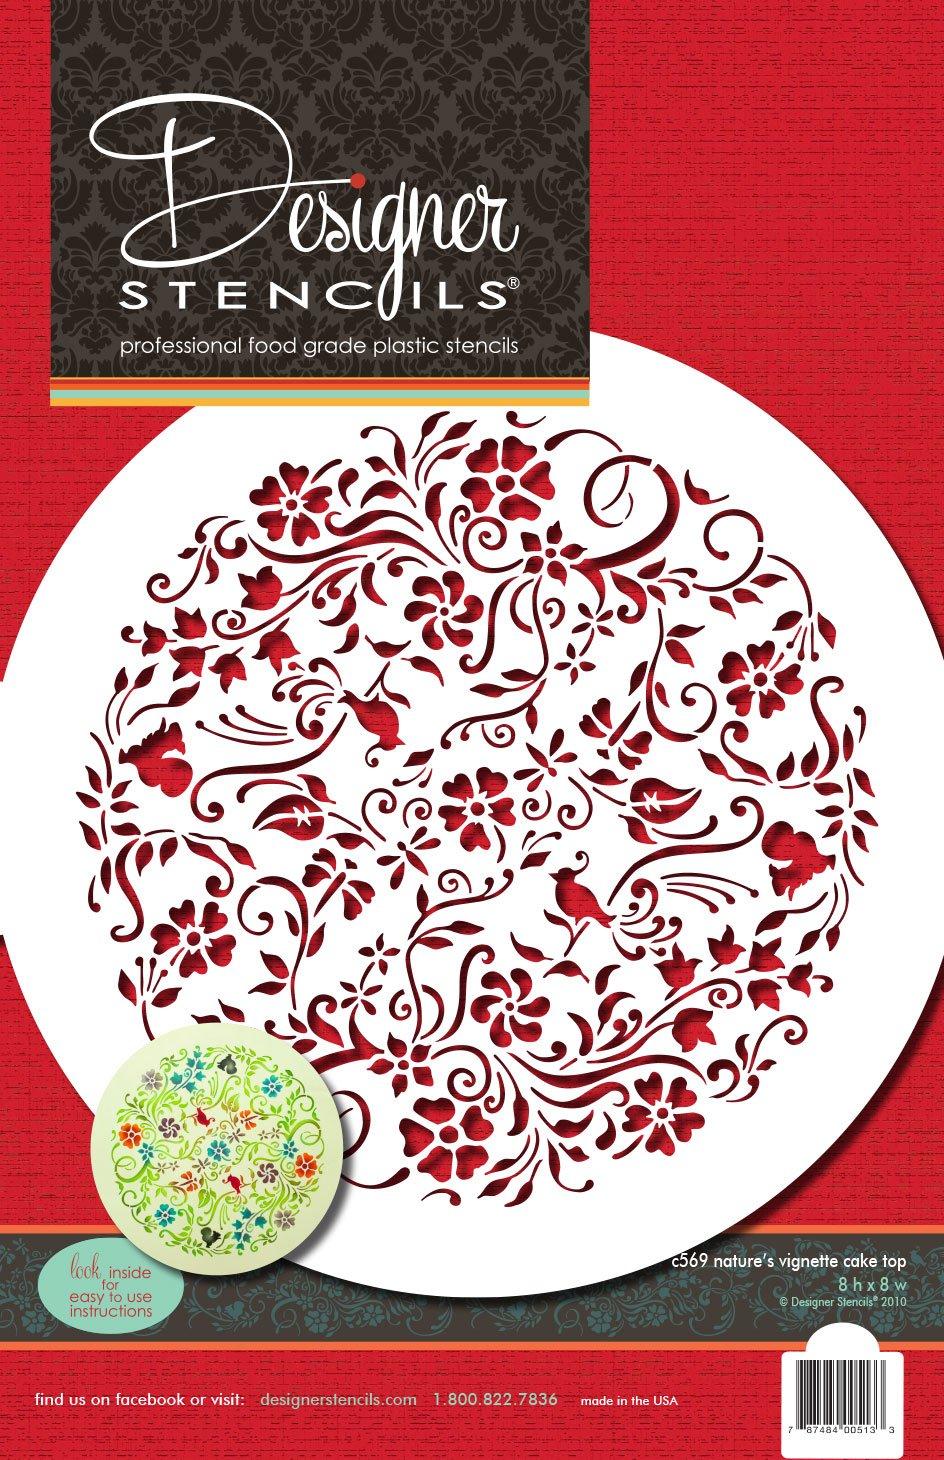 Designer Stencils C569 Nature's Vignette Cake Stencil Top, Beige/semi-transparent by Designer Stencils (Image #3)